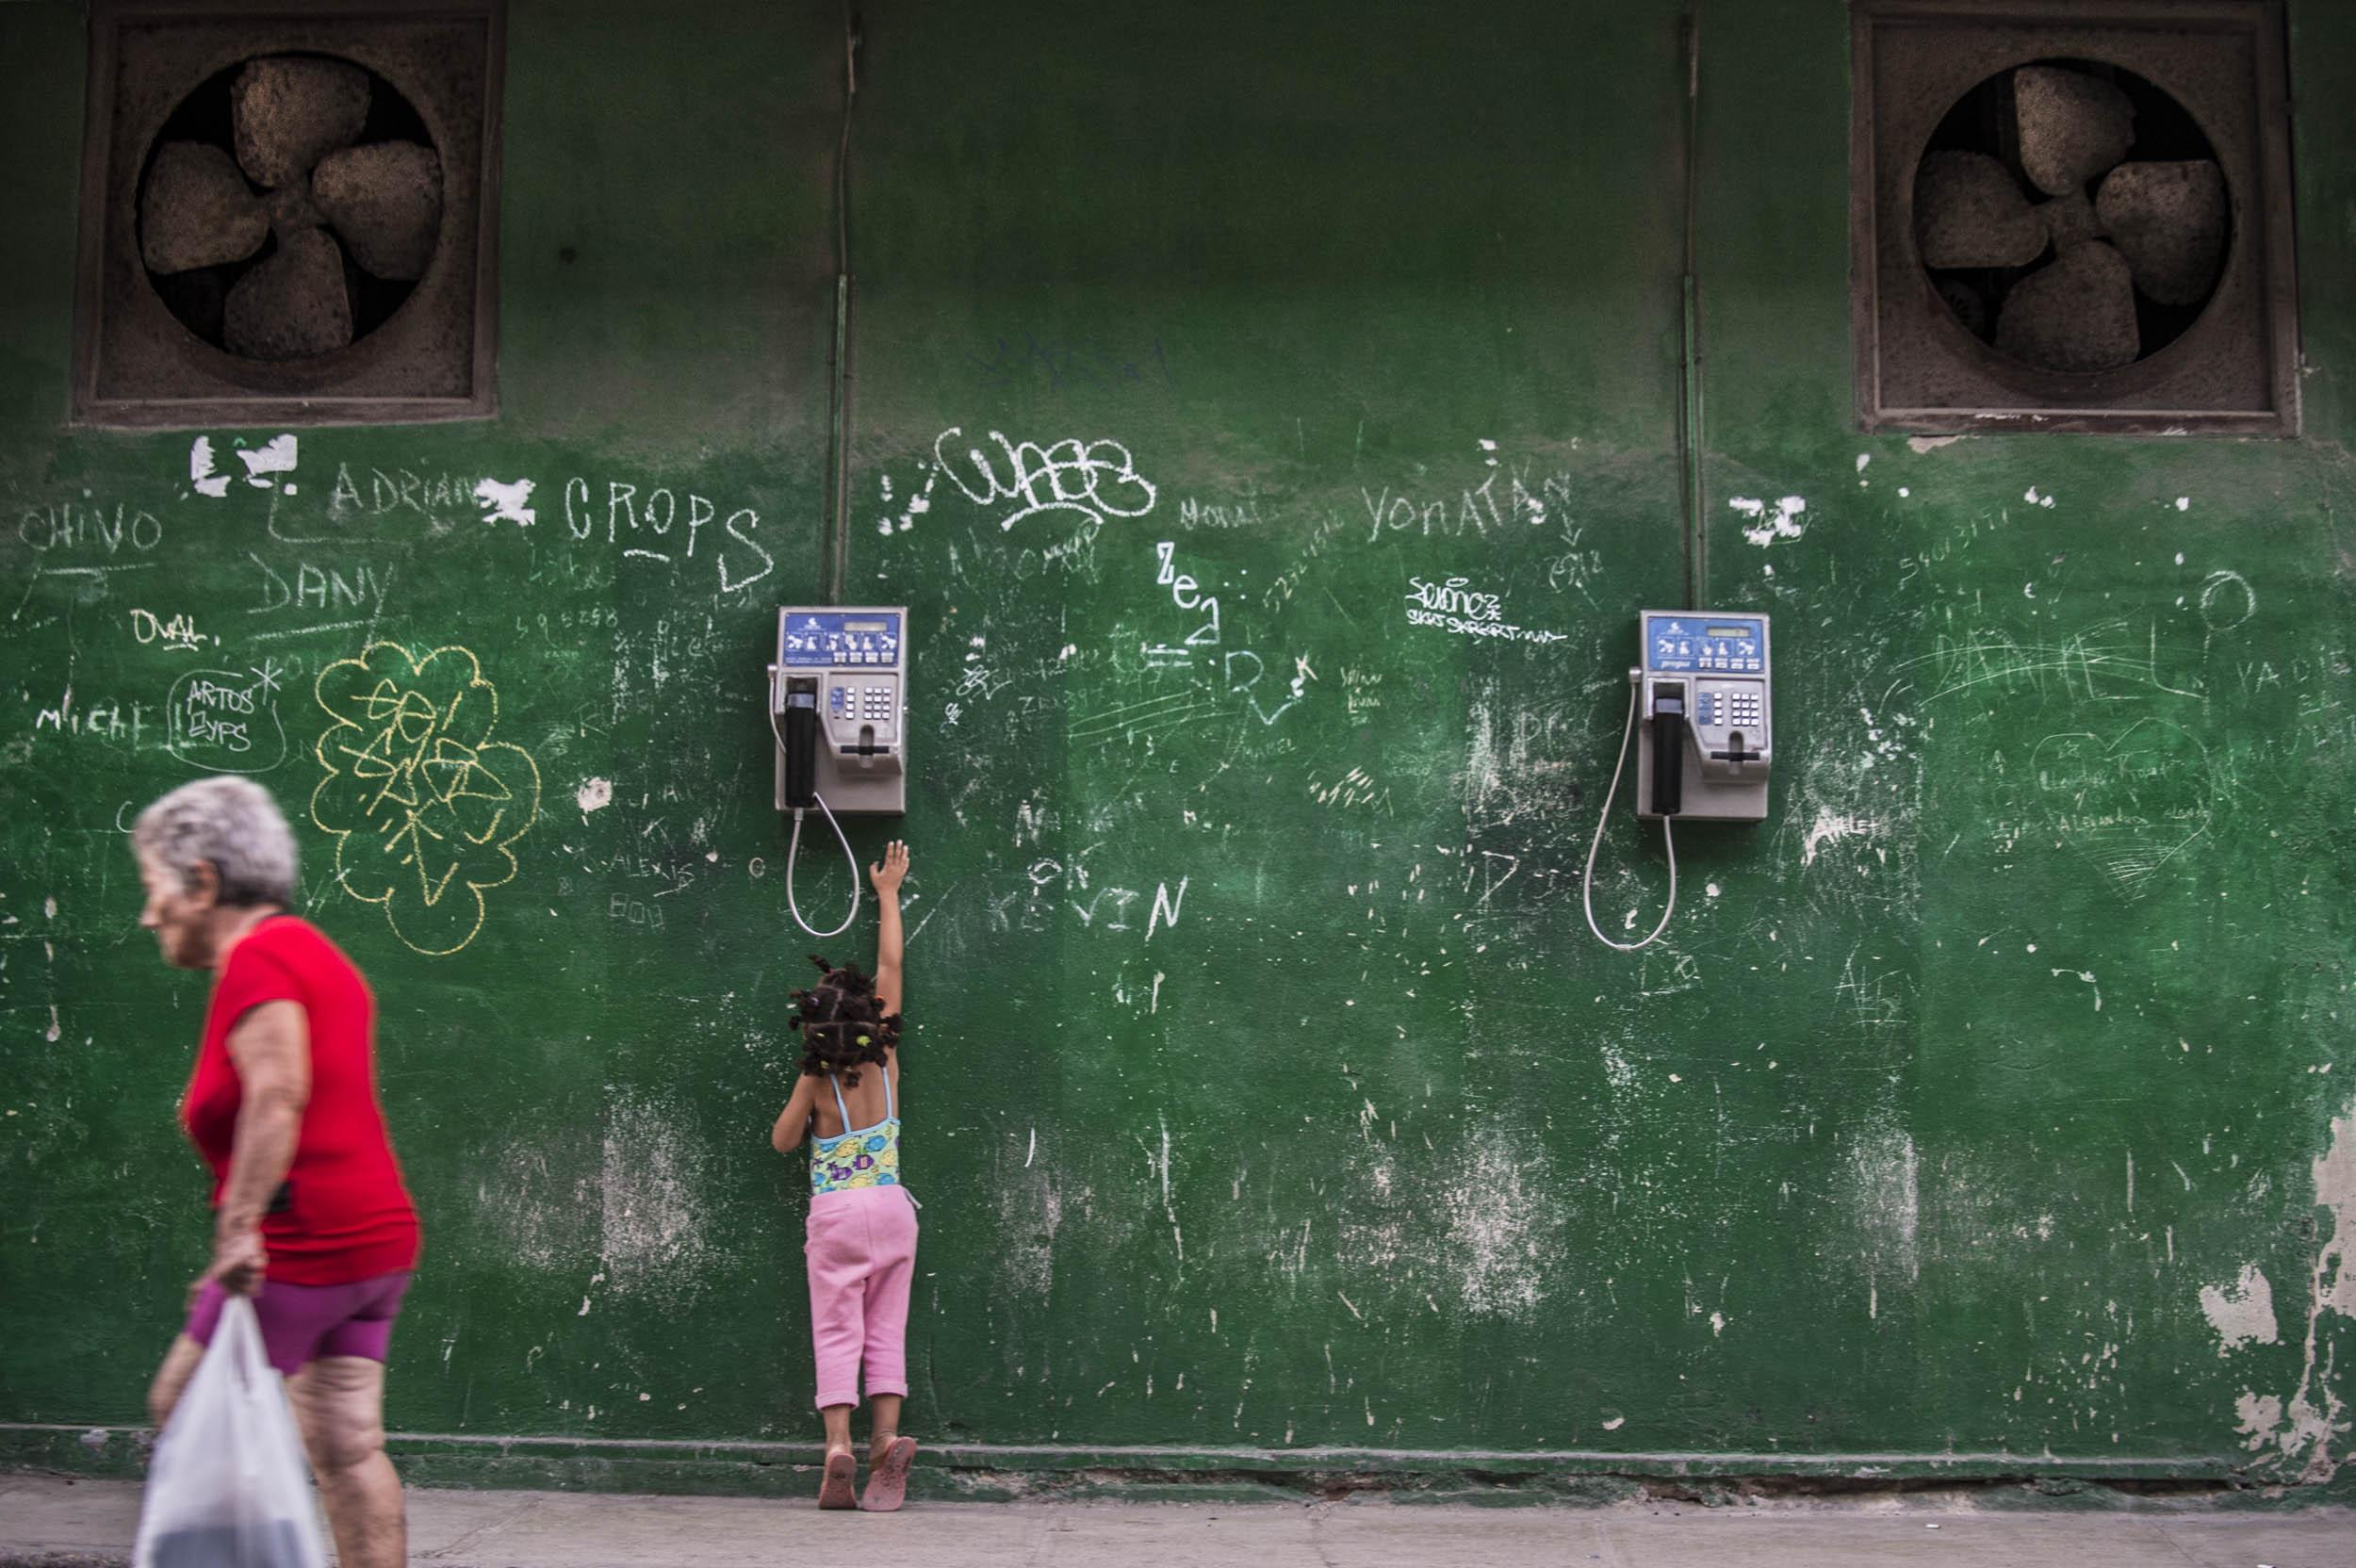 Llamar - Cuba - Hector Garrido, Aerial and human photography